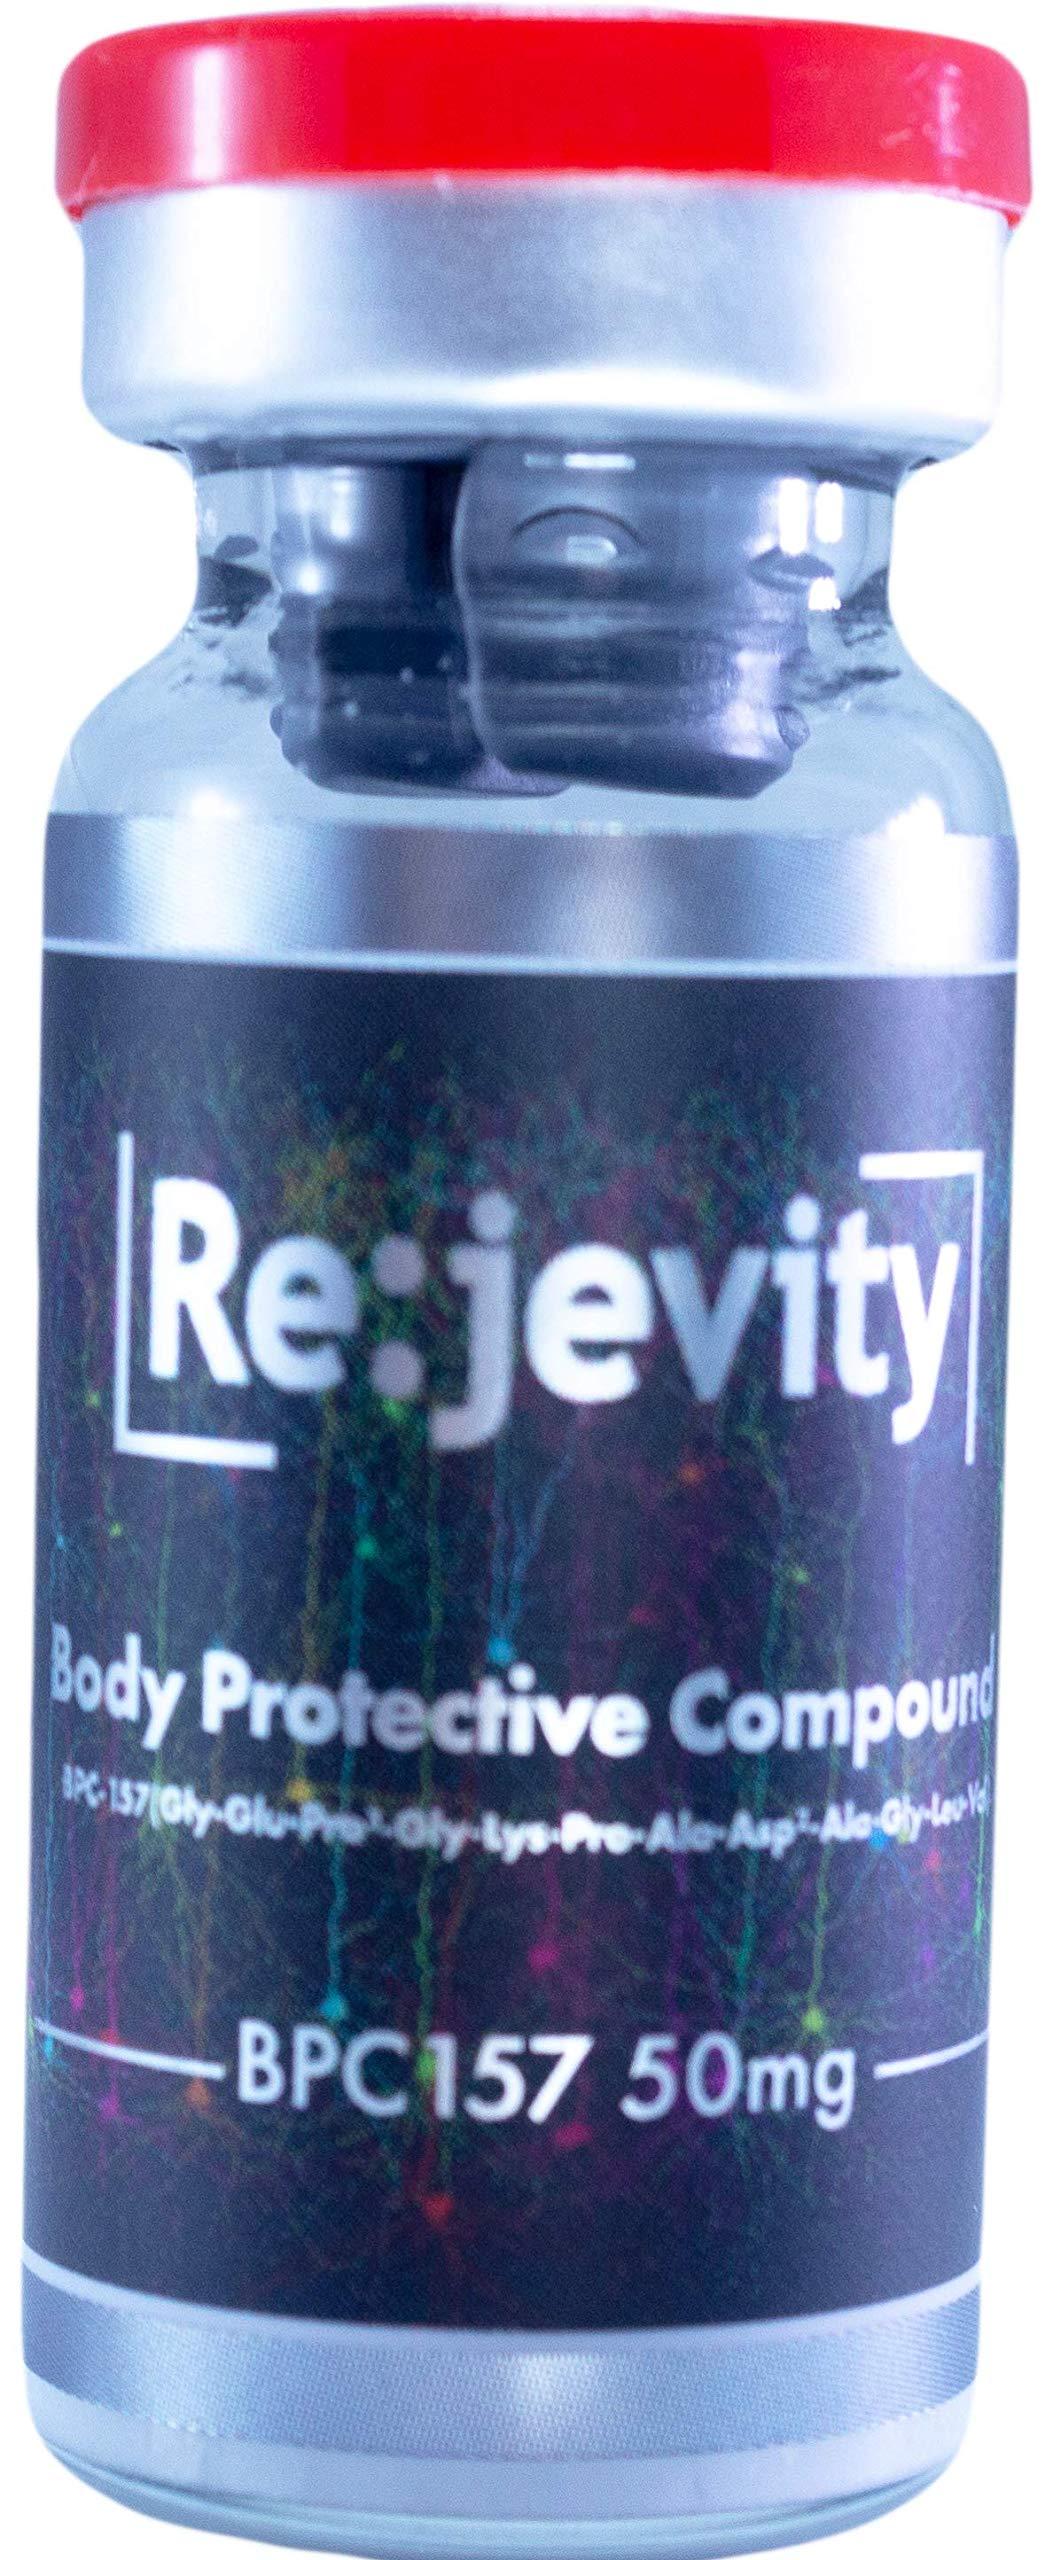 Rejevity BPC-157 50mg (Body Protective Compound) by GroupGanix (Image #1)